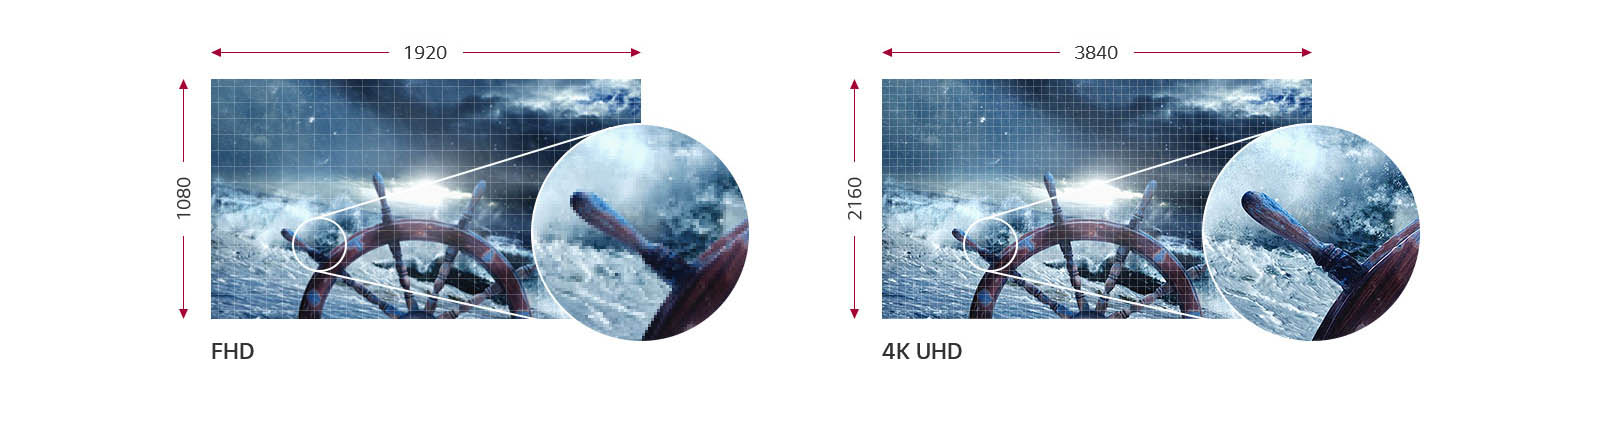 LG HU80KA 4K UHD Laser Smart Home Theater CineBeam Projector